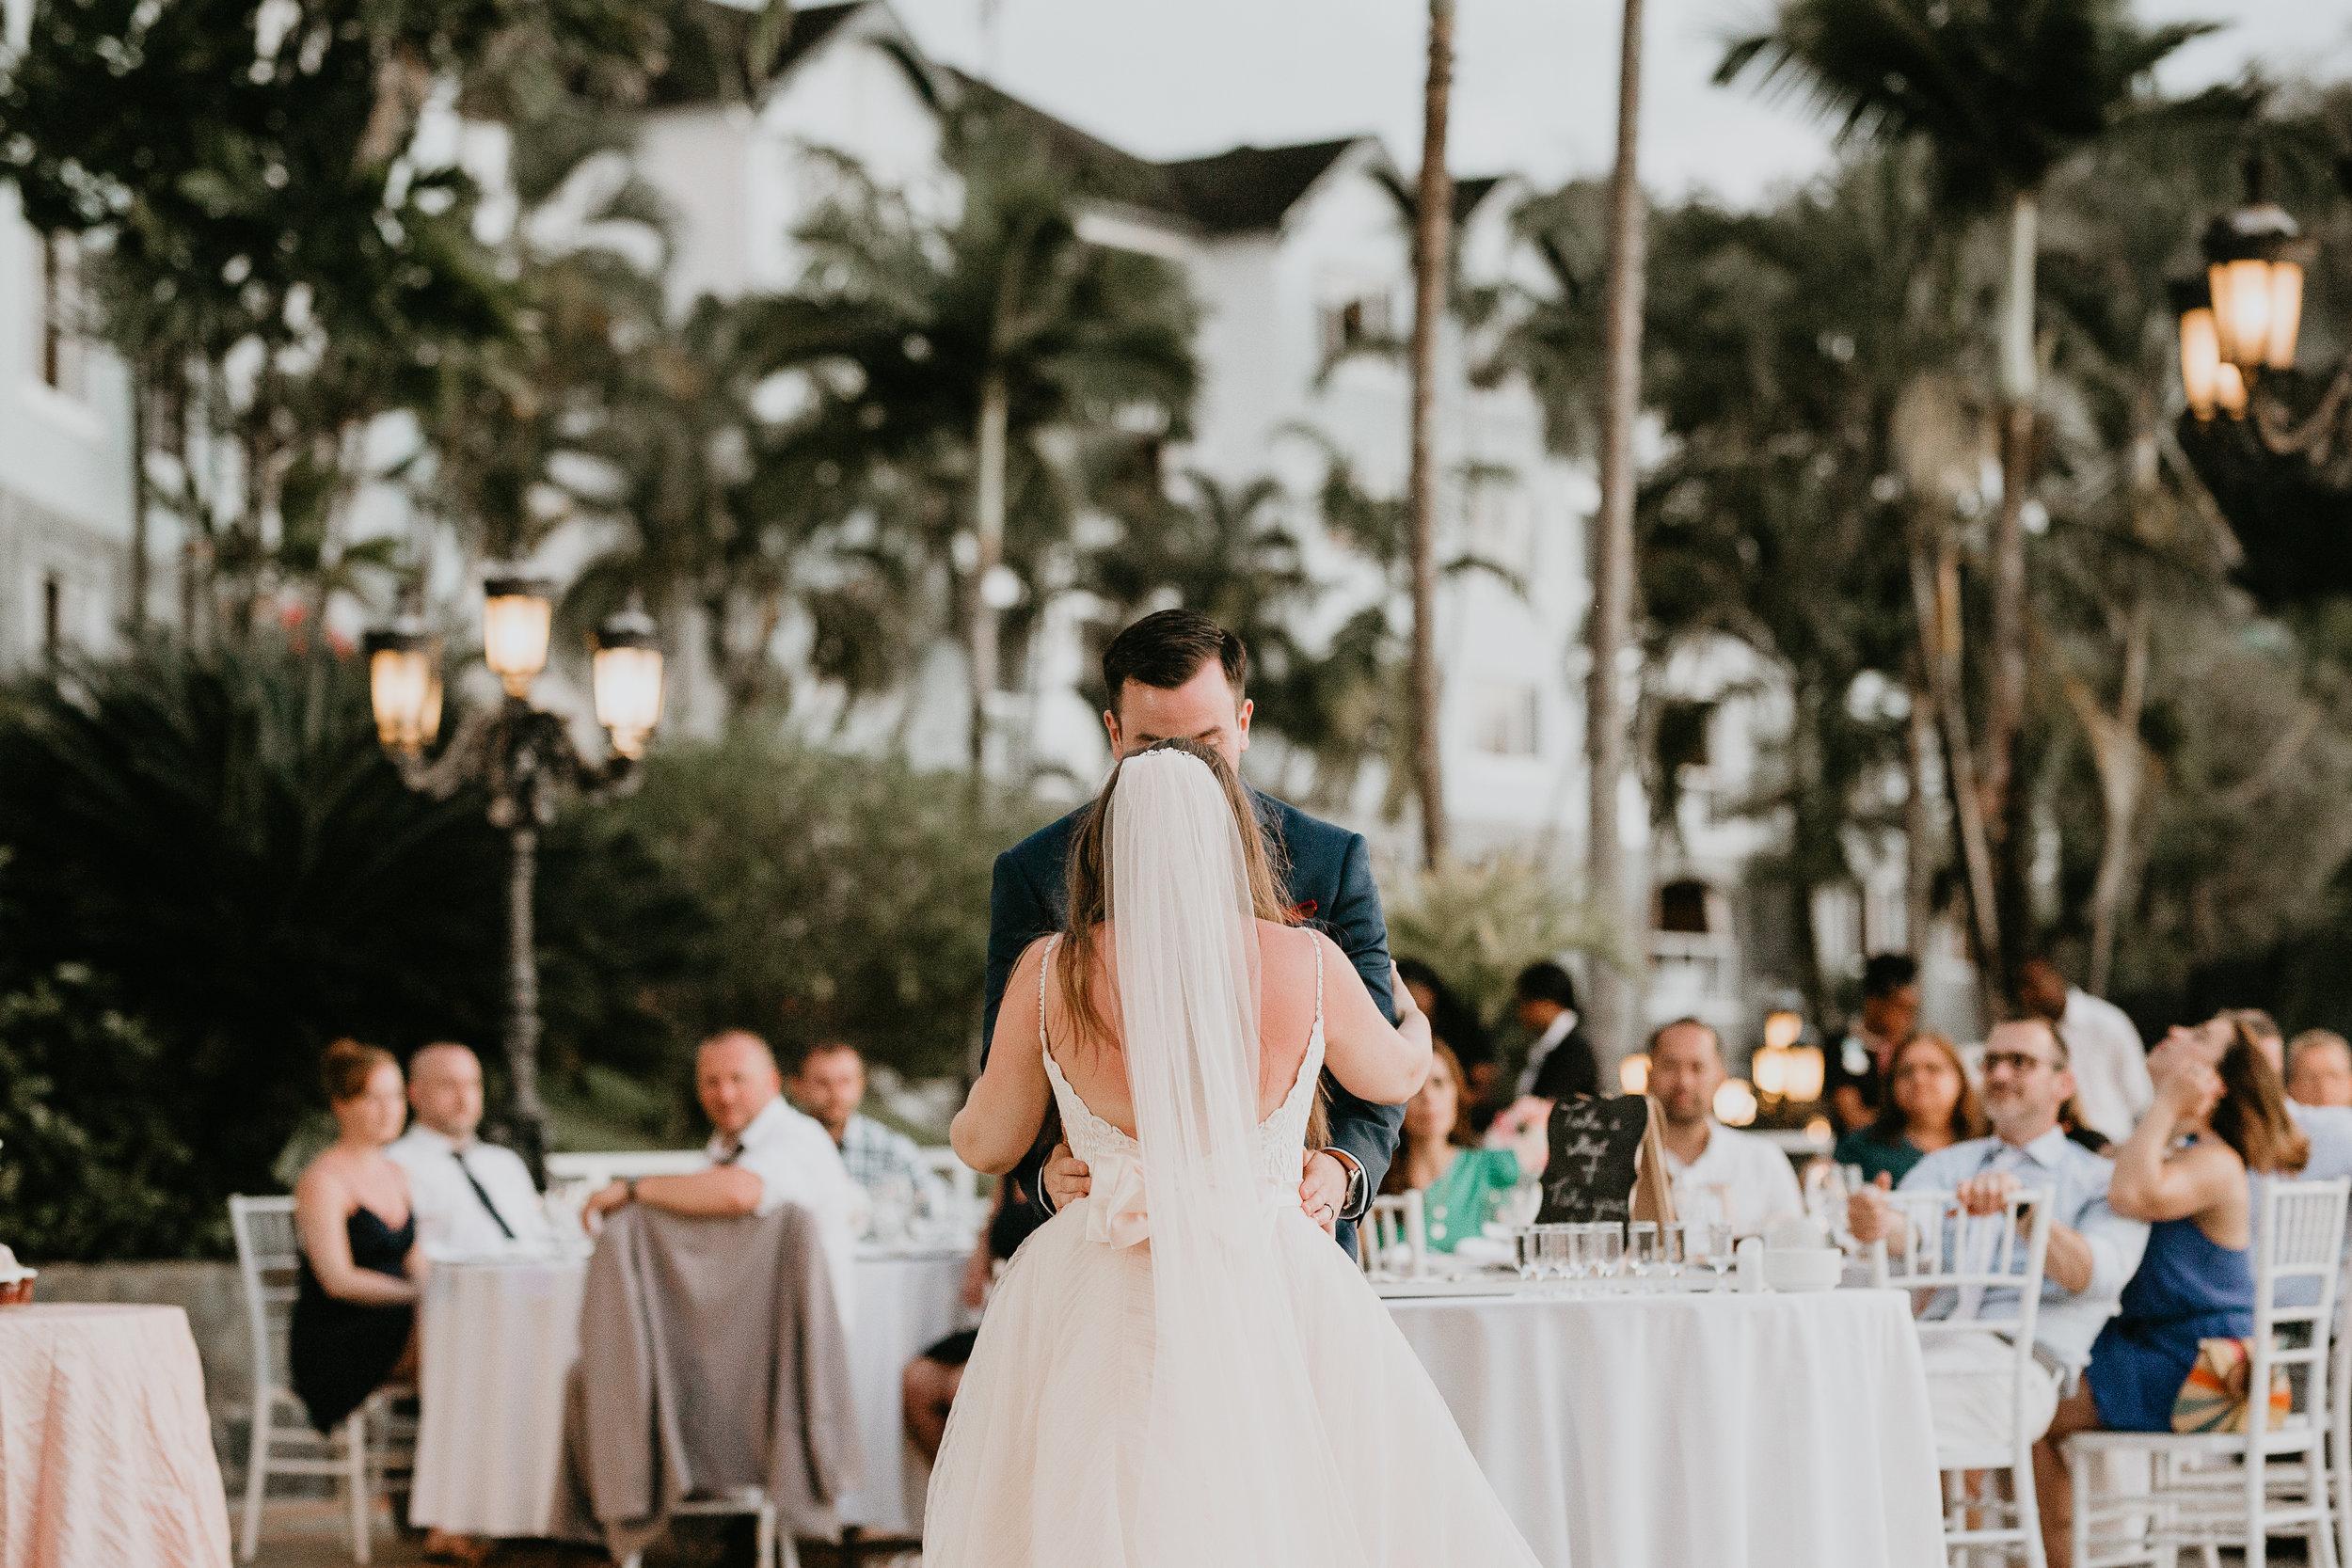 nicole-daacke-photography-destination-wedding-in-st-lucia-sandals-la-toc-intimate-island-wedding-carribean-elopement-photographer-chill-island-wedding-133.jpg